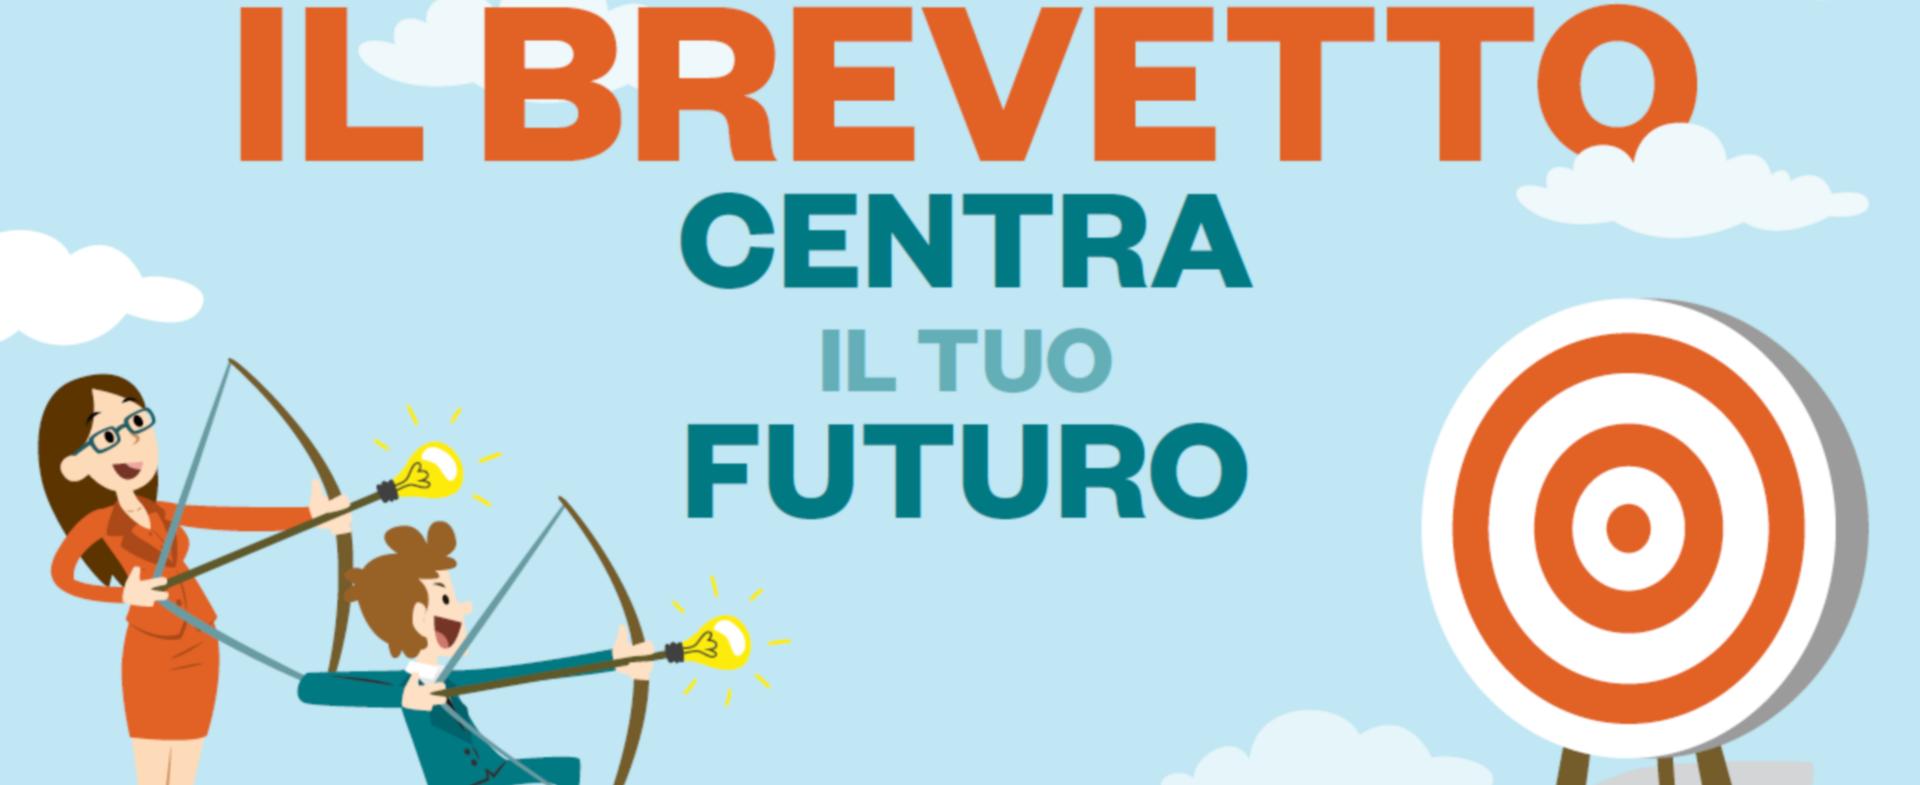 http://www.areasciencepark.it/innovazione/premio-bernardo-nobile-2/